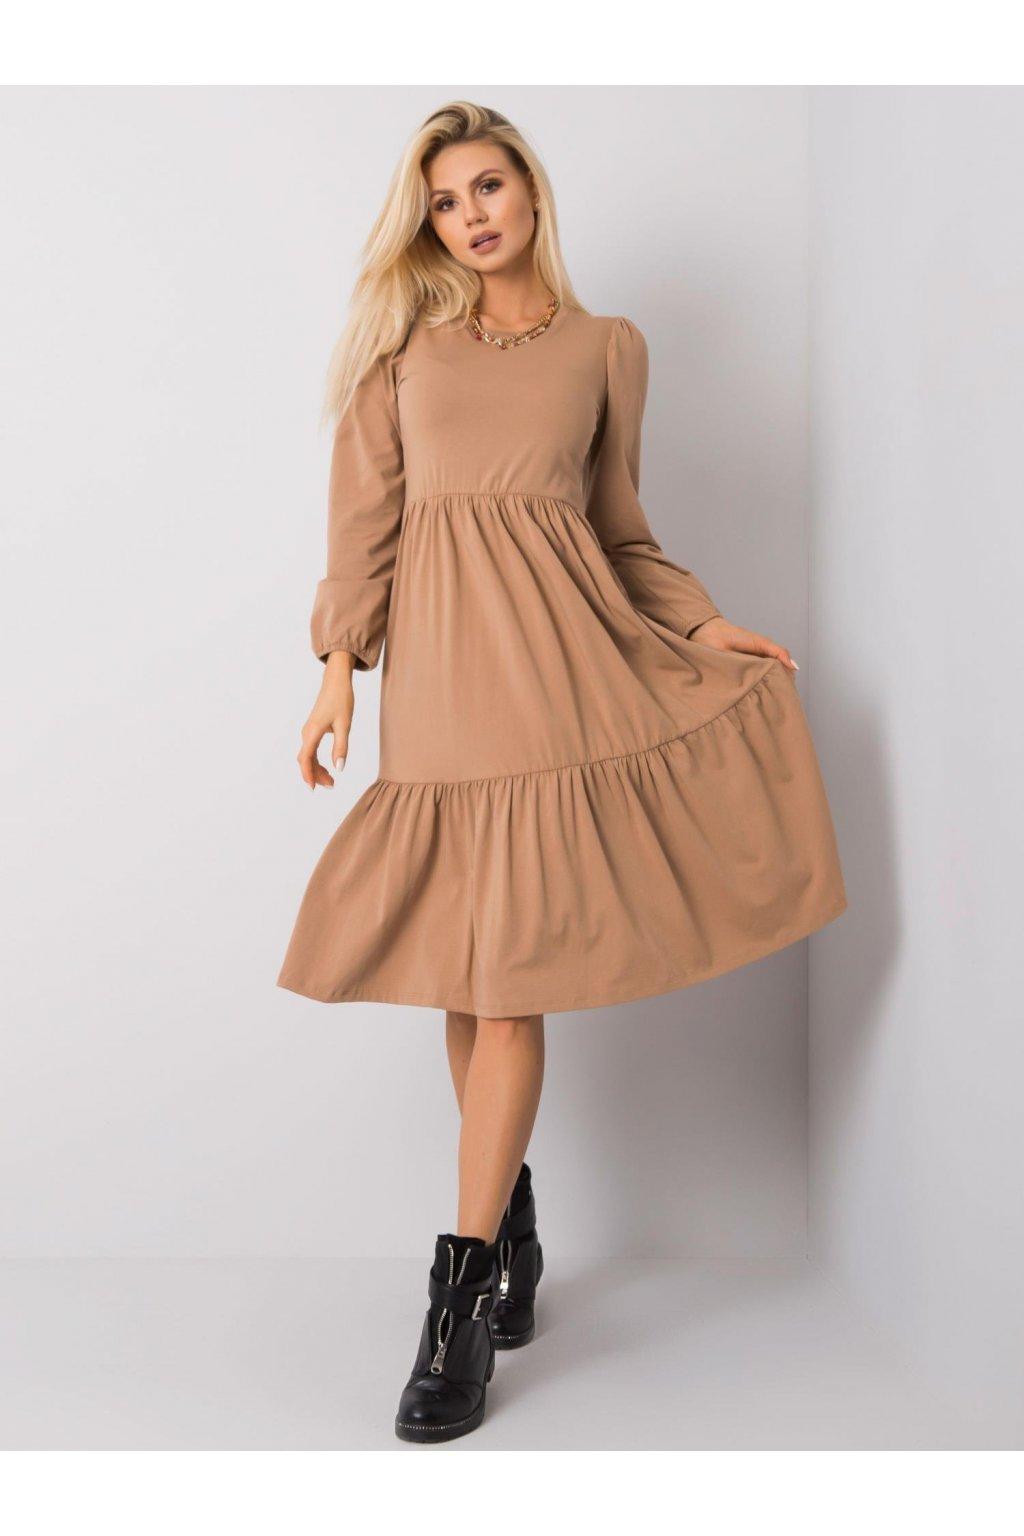 pol pl Camelowa sukienka Yonne RUE PARIS 357959 4